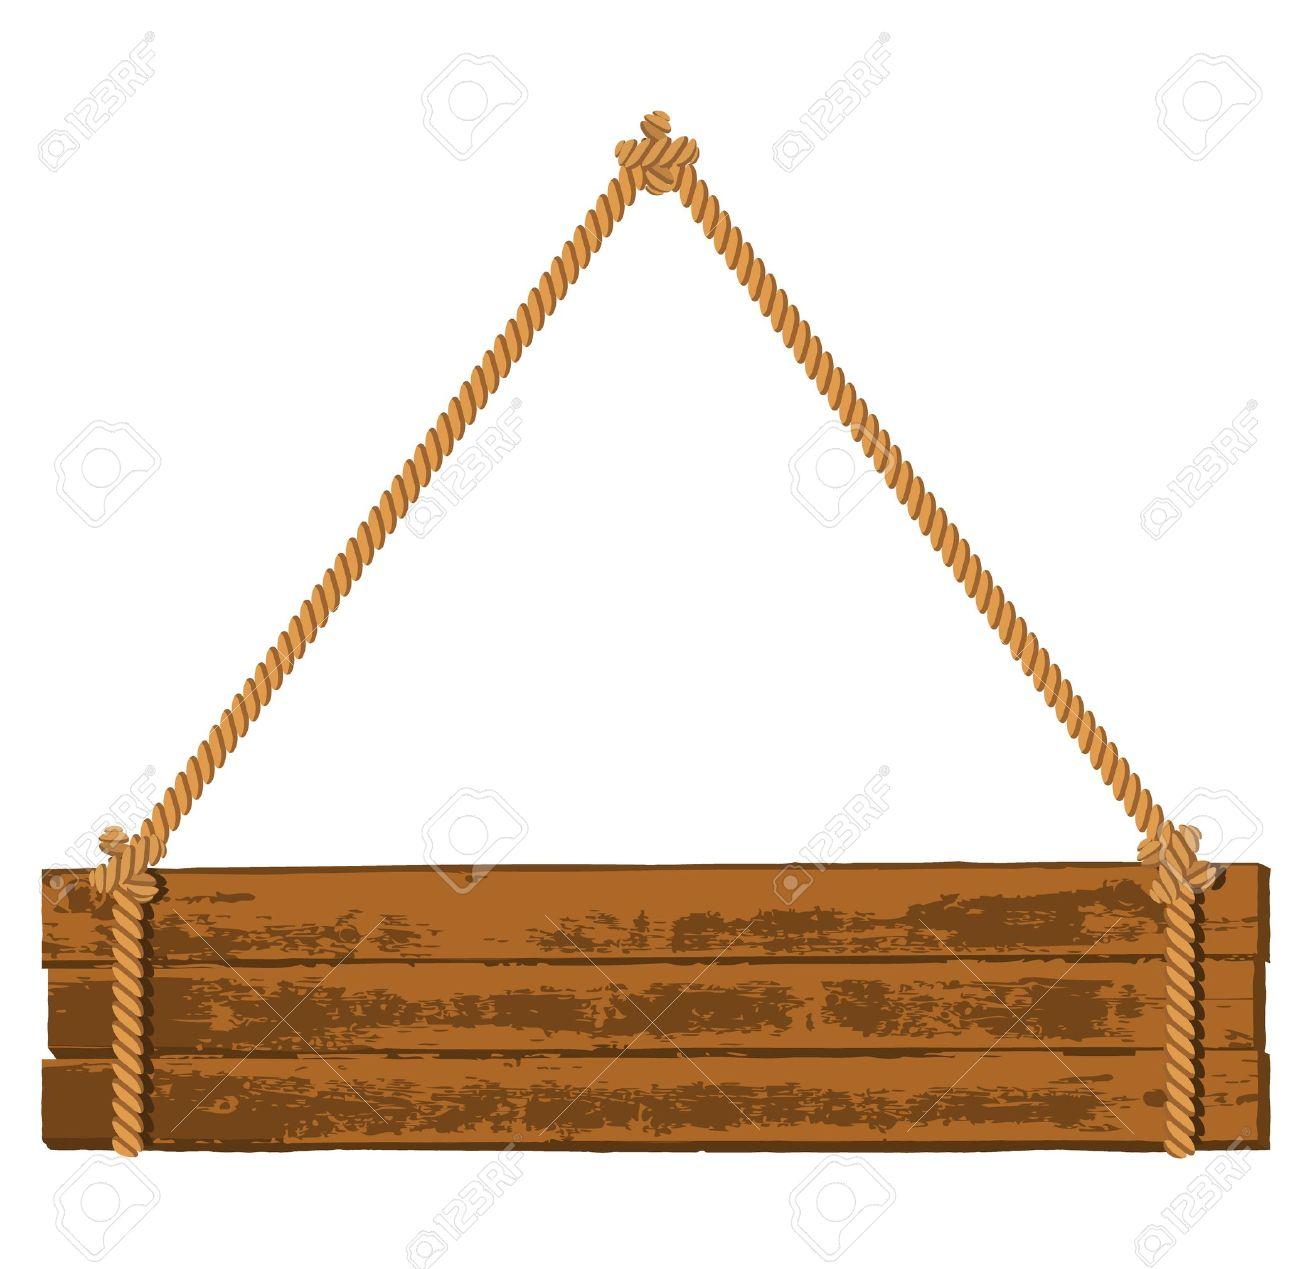 Wooden signboard.